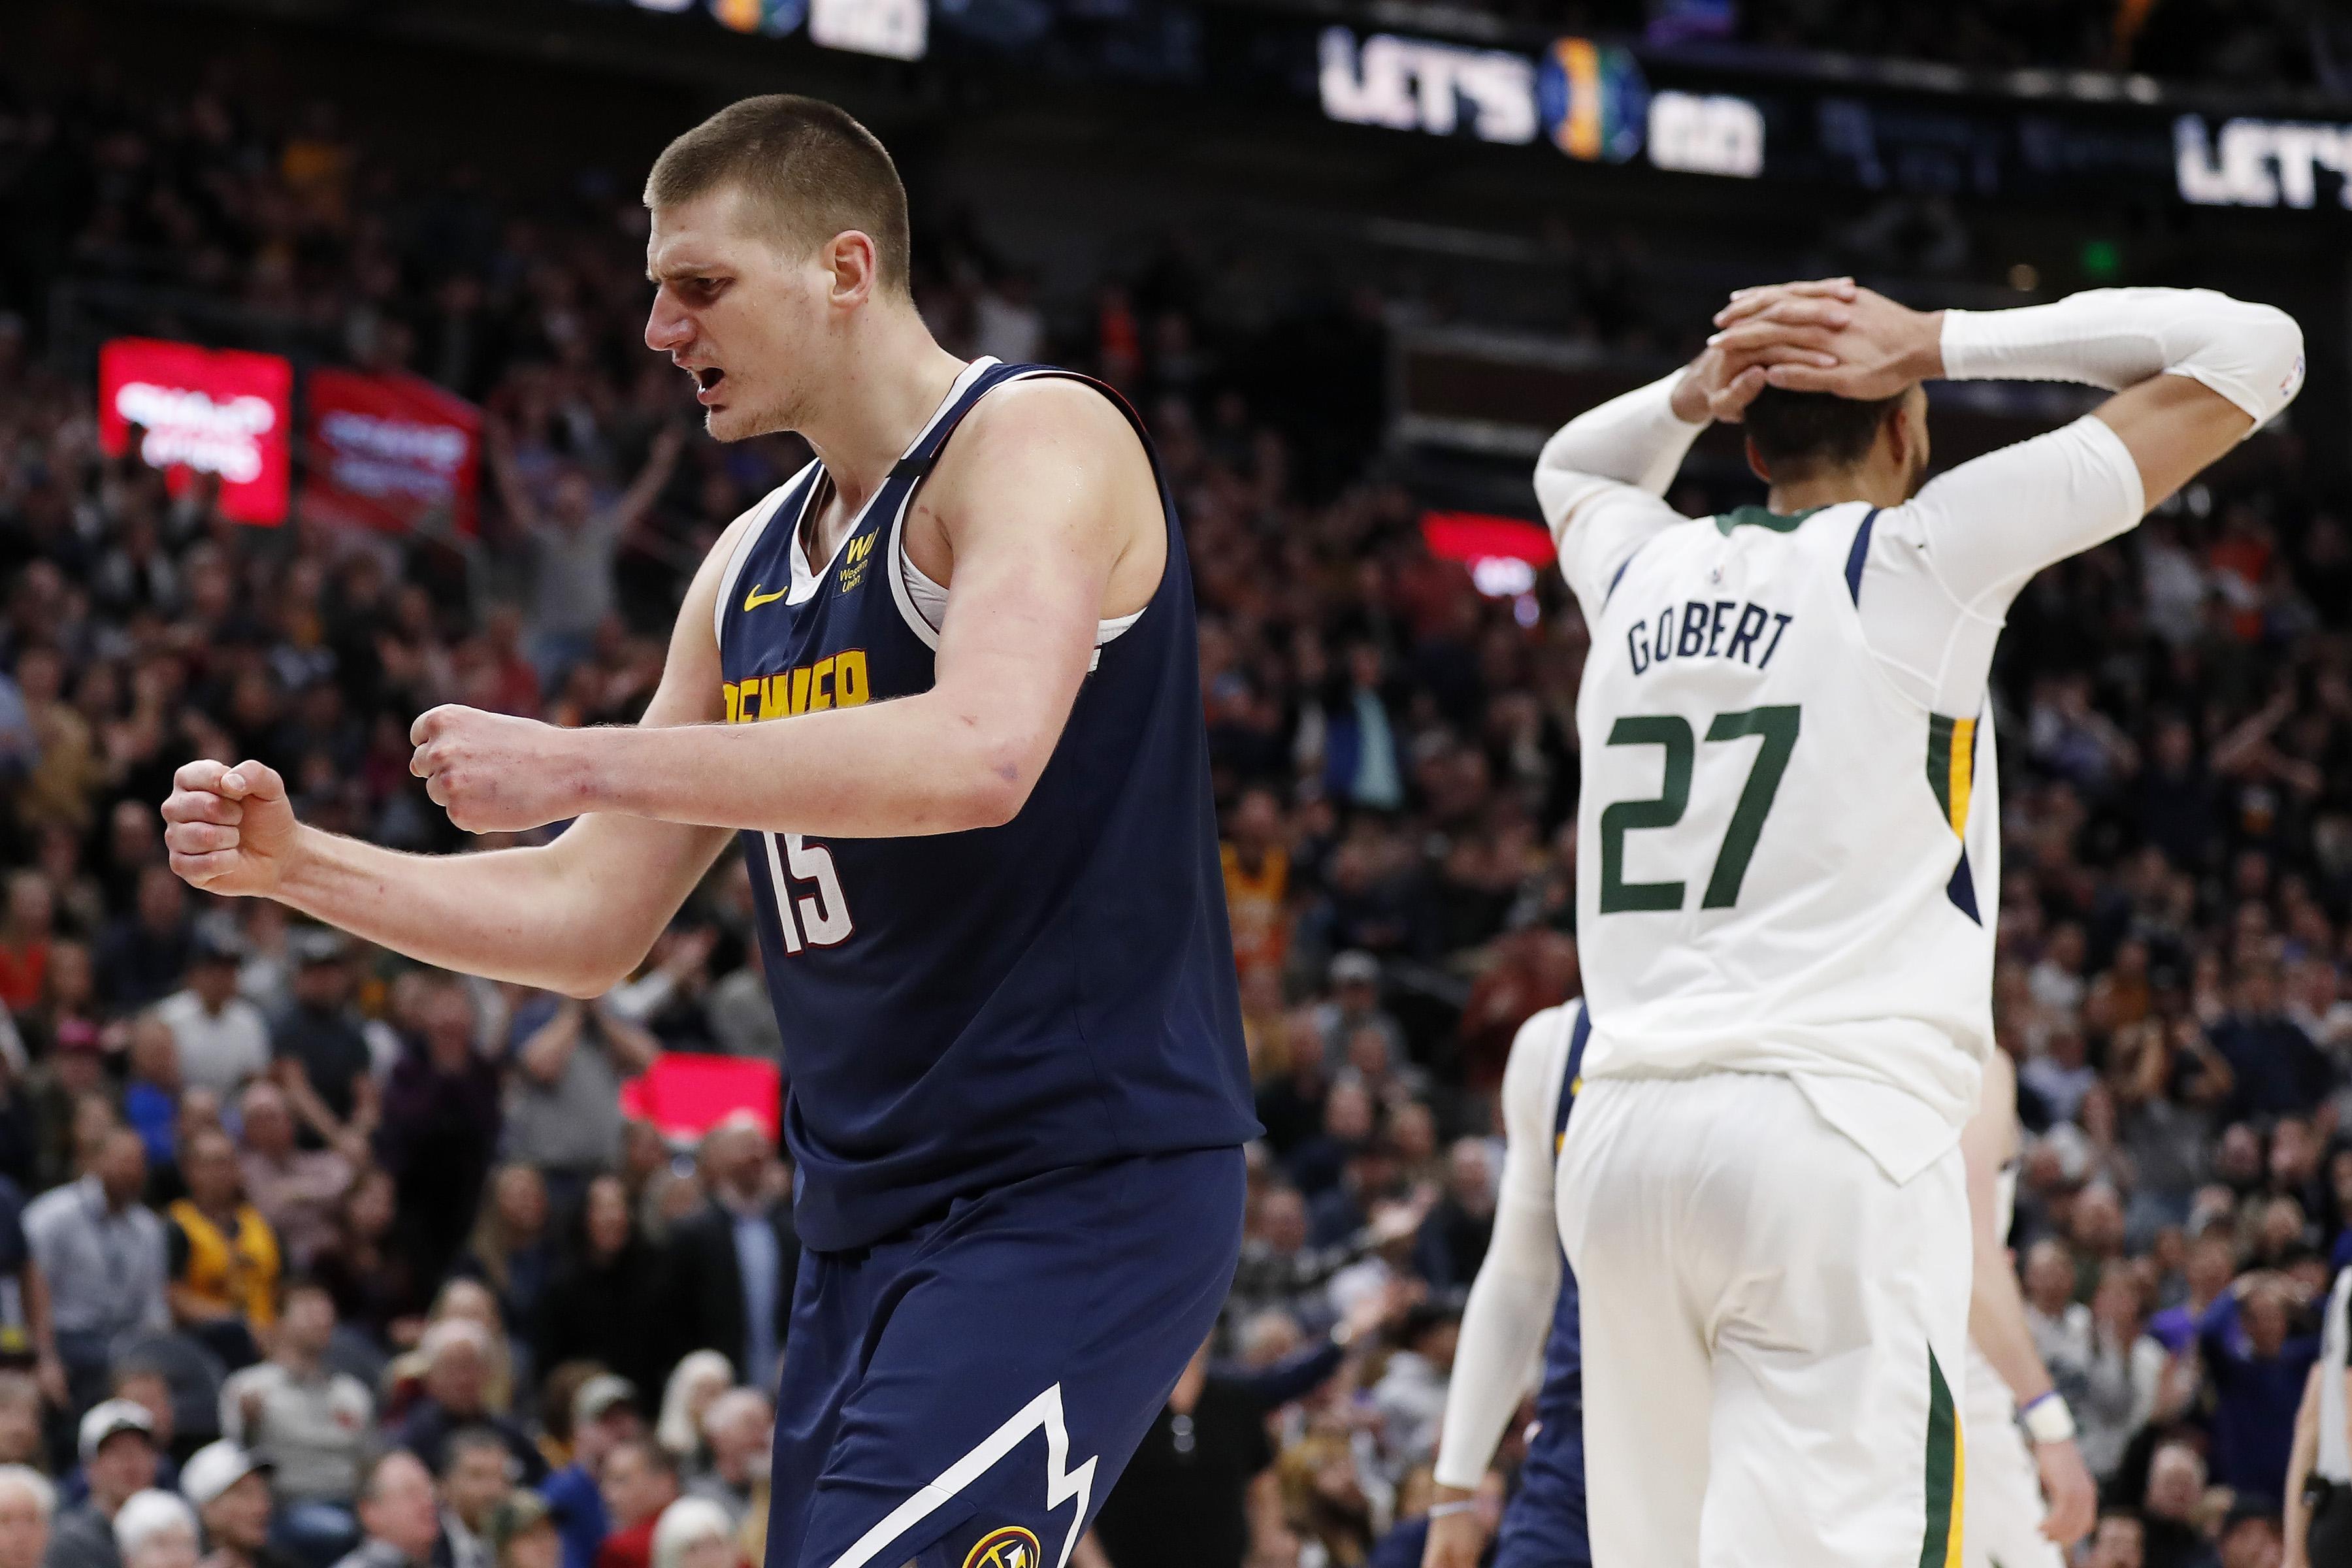 Denver Nuggets center Nikola Jokic (15) reacts after a foul against Utah Jazz guard Joe Ingles (2) (not pictured) during the fourth quarter at Vivint Smart Home Arena.